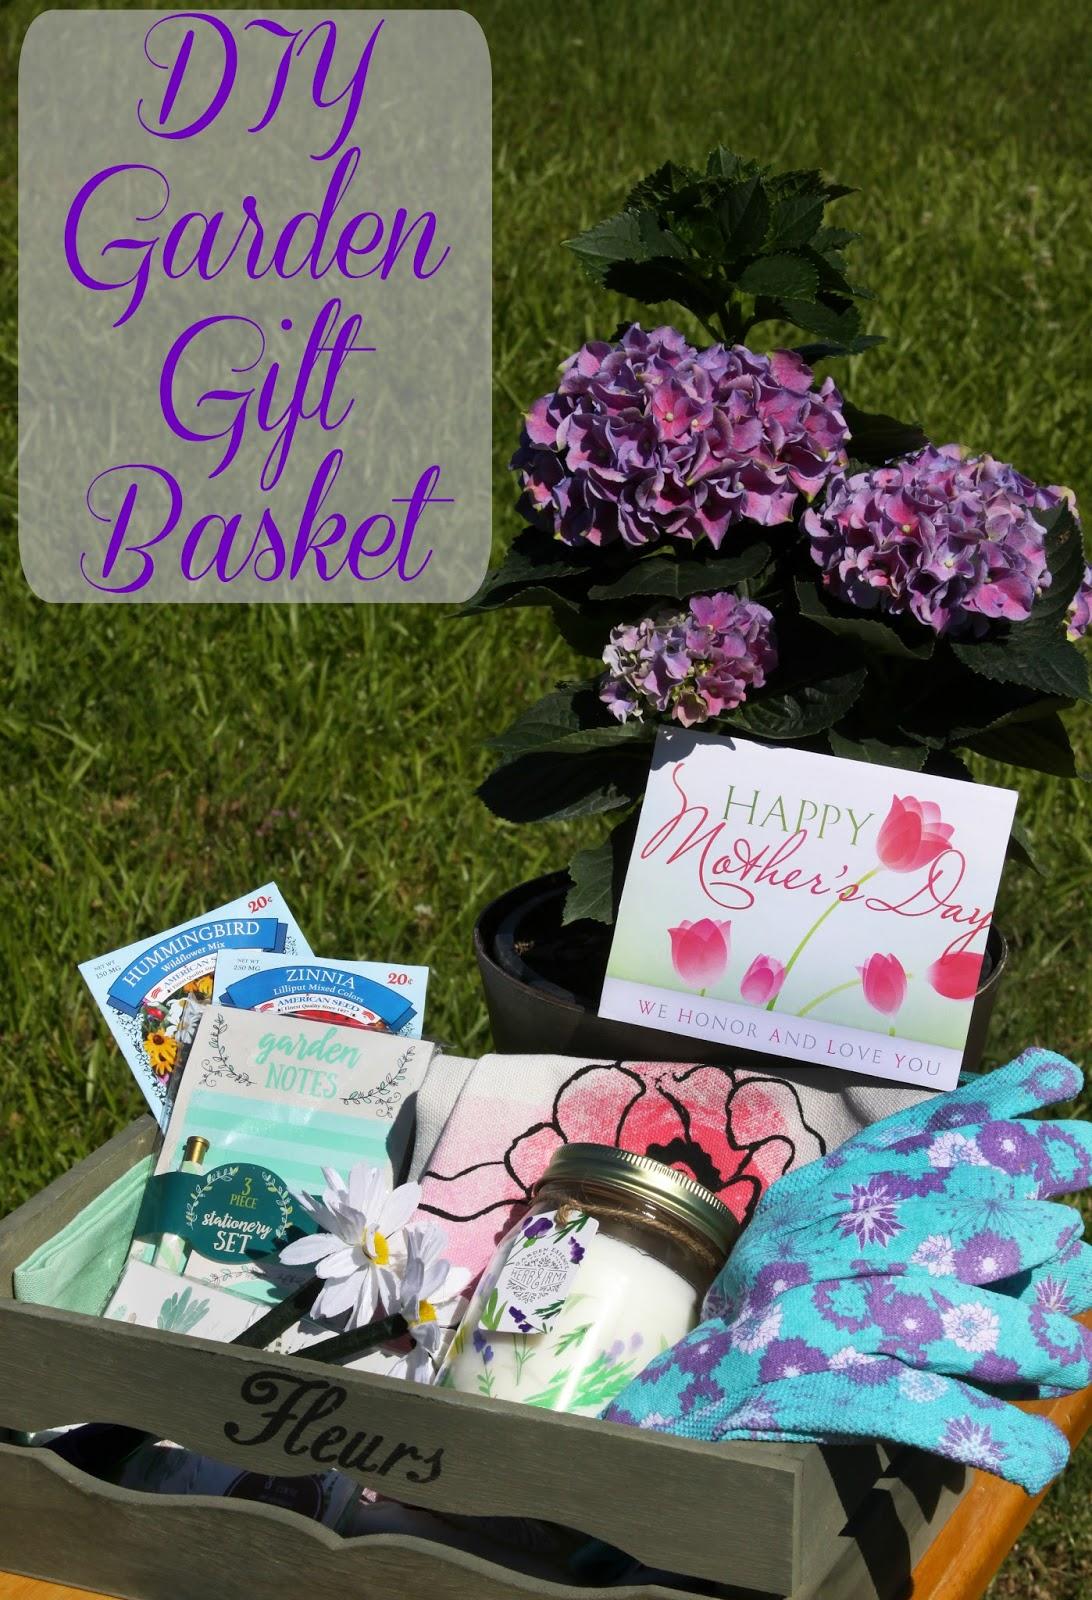 for the love of food diy garden essential oils gift baskets for mother 39 s day with dreftspring. Black Bedroom Furniture Sets. Home Design Ideas